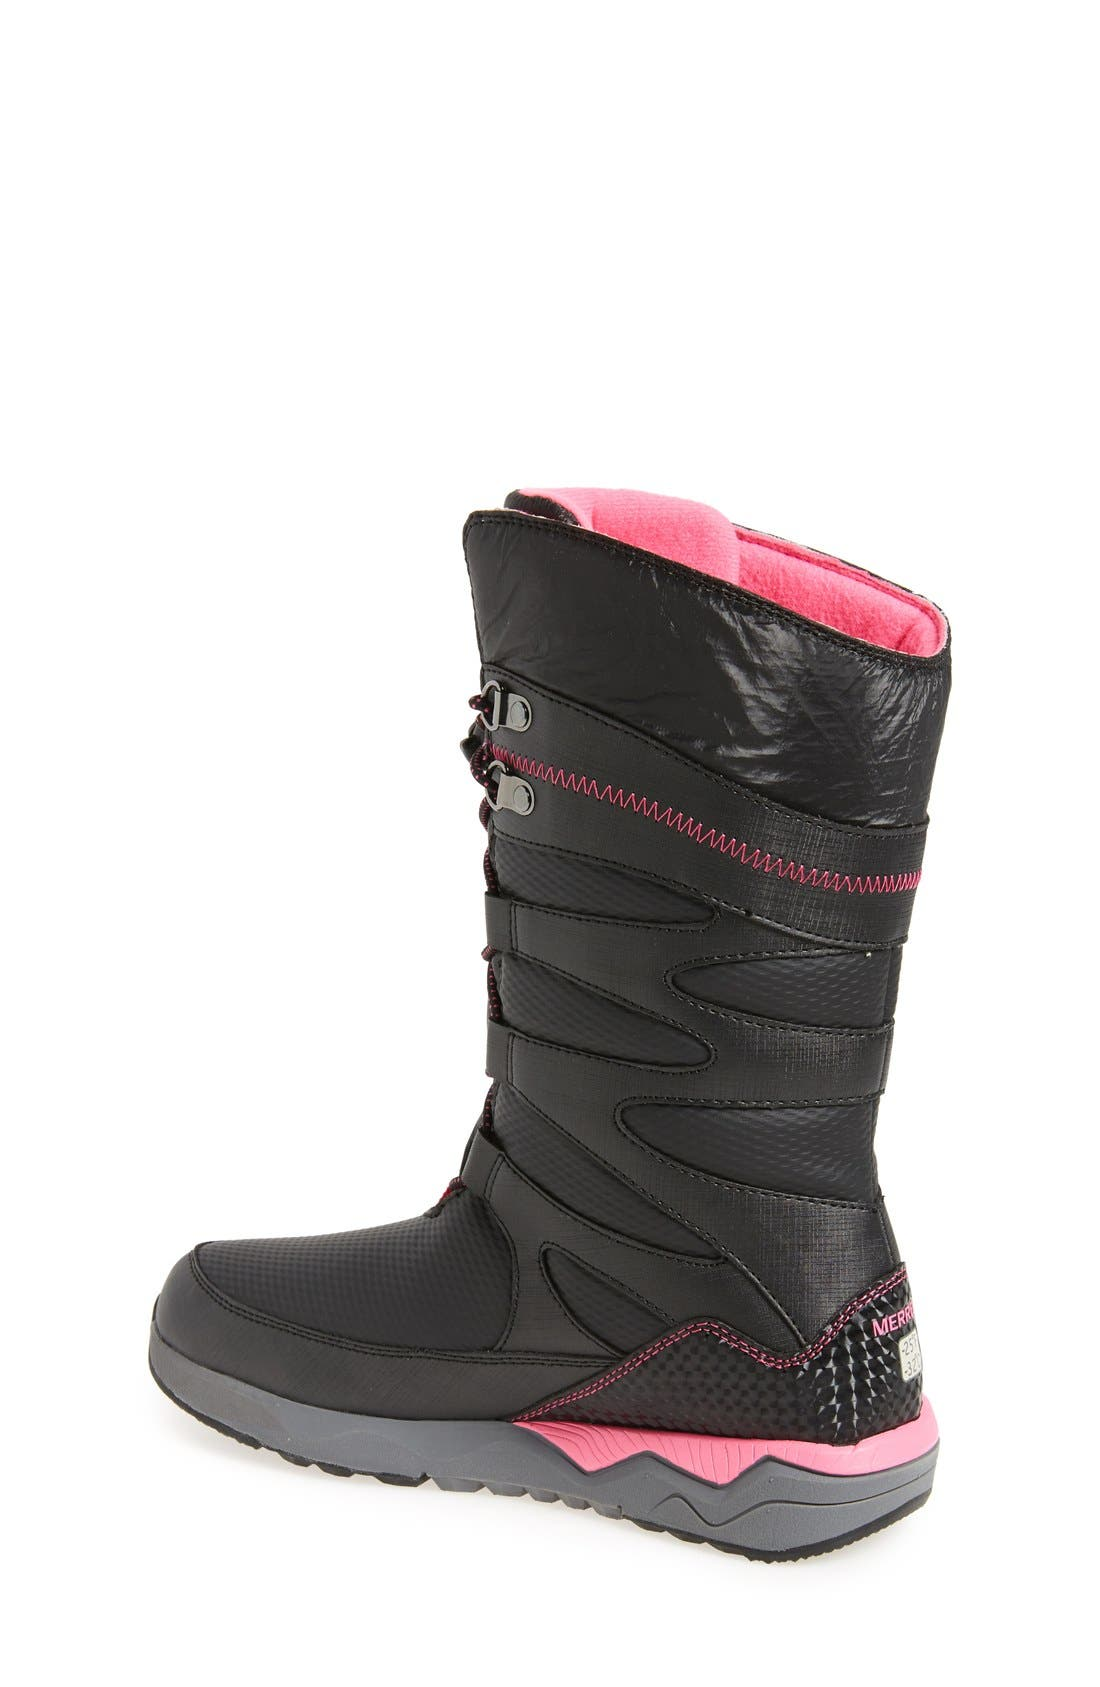 'Arctic Blast' Waterproof Snow Boot,                             Alternate thumbnail 2, color,                             Black/ Pink